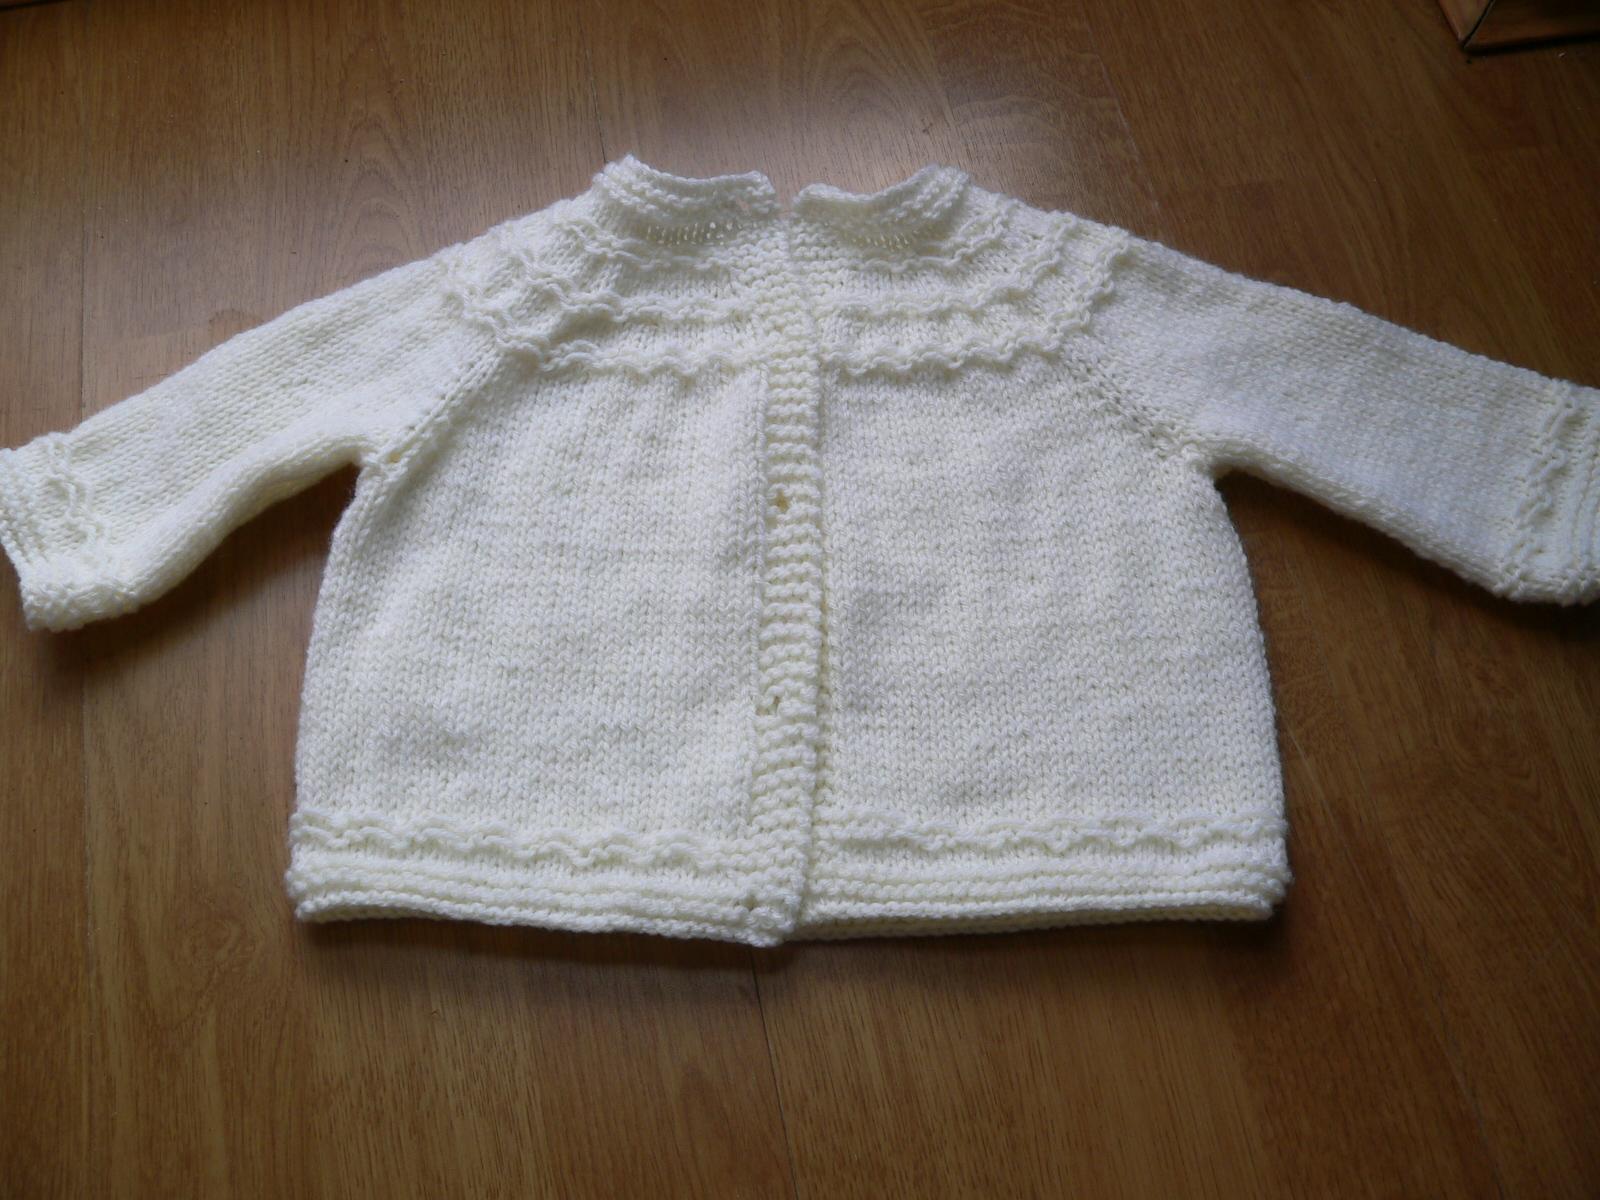 Knitting Pattern For Baby Seamless Yoked Sweater : The Blattcave: POTD: Seamless Yoked Baby Cardigan